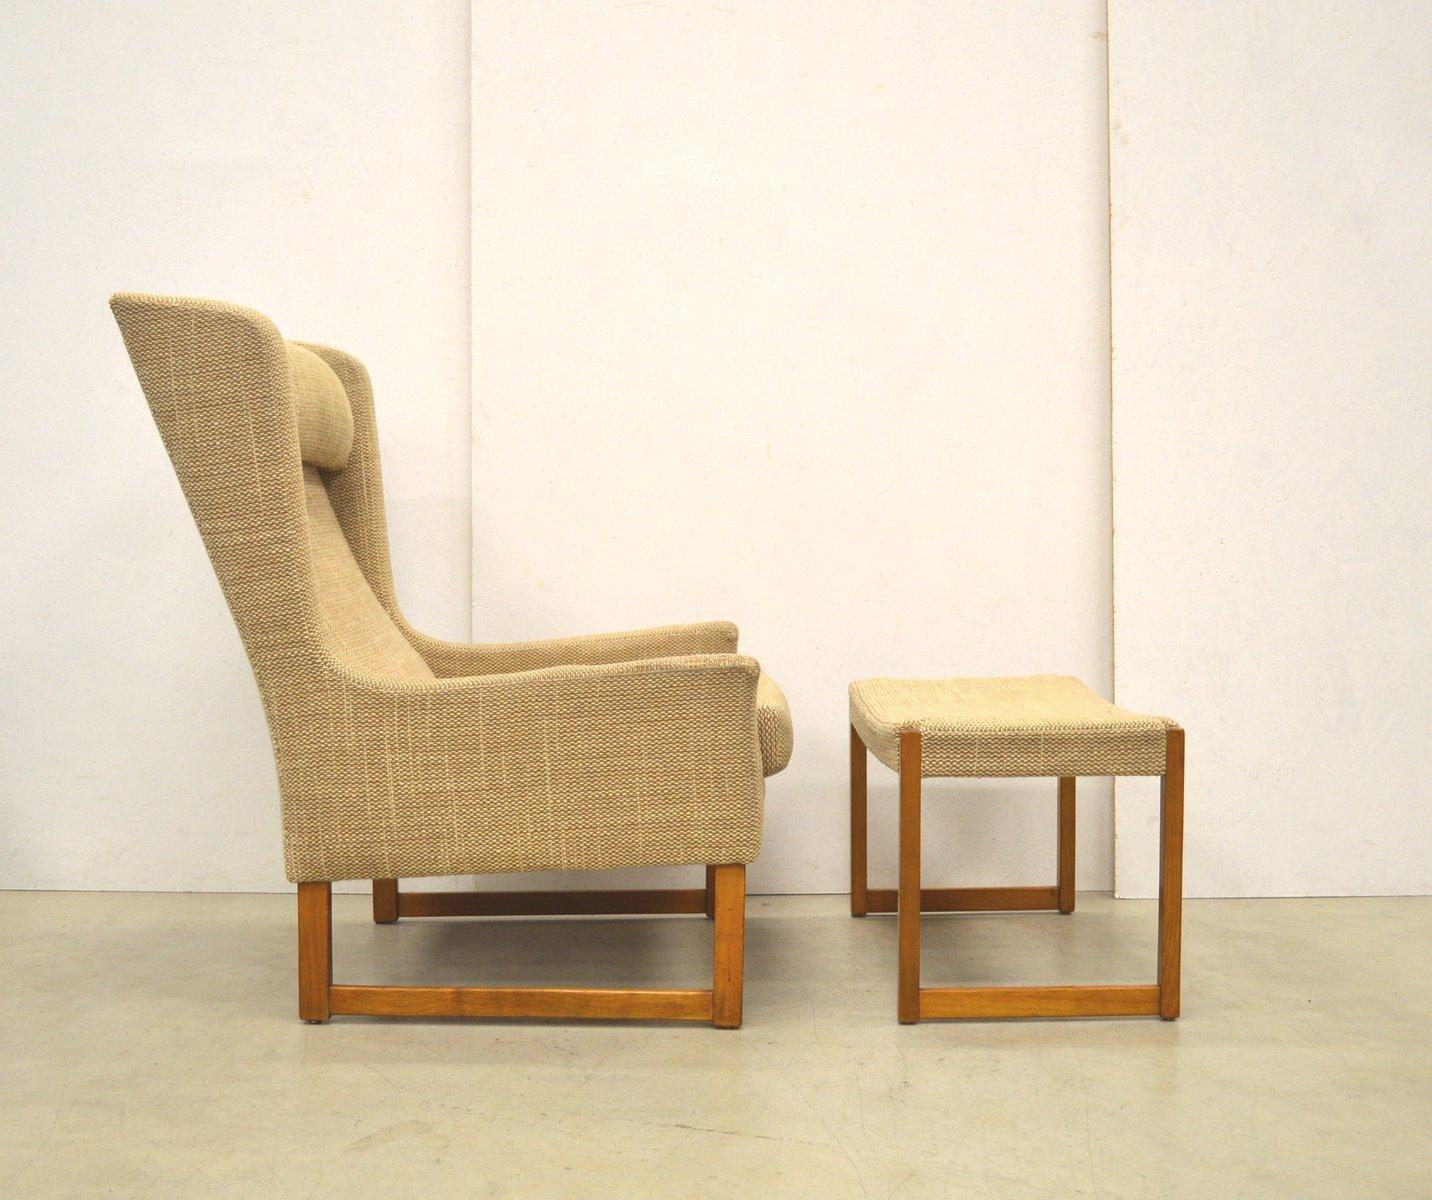 ohrensessel hocker great full size of ohrensessel ikea. Black Bedroom Furniture Sets. Home Design Ideas